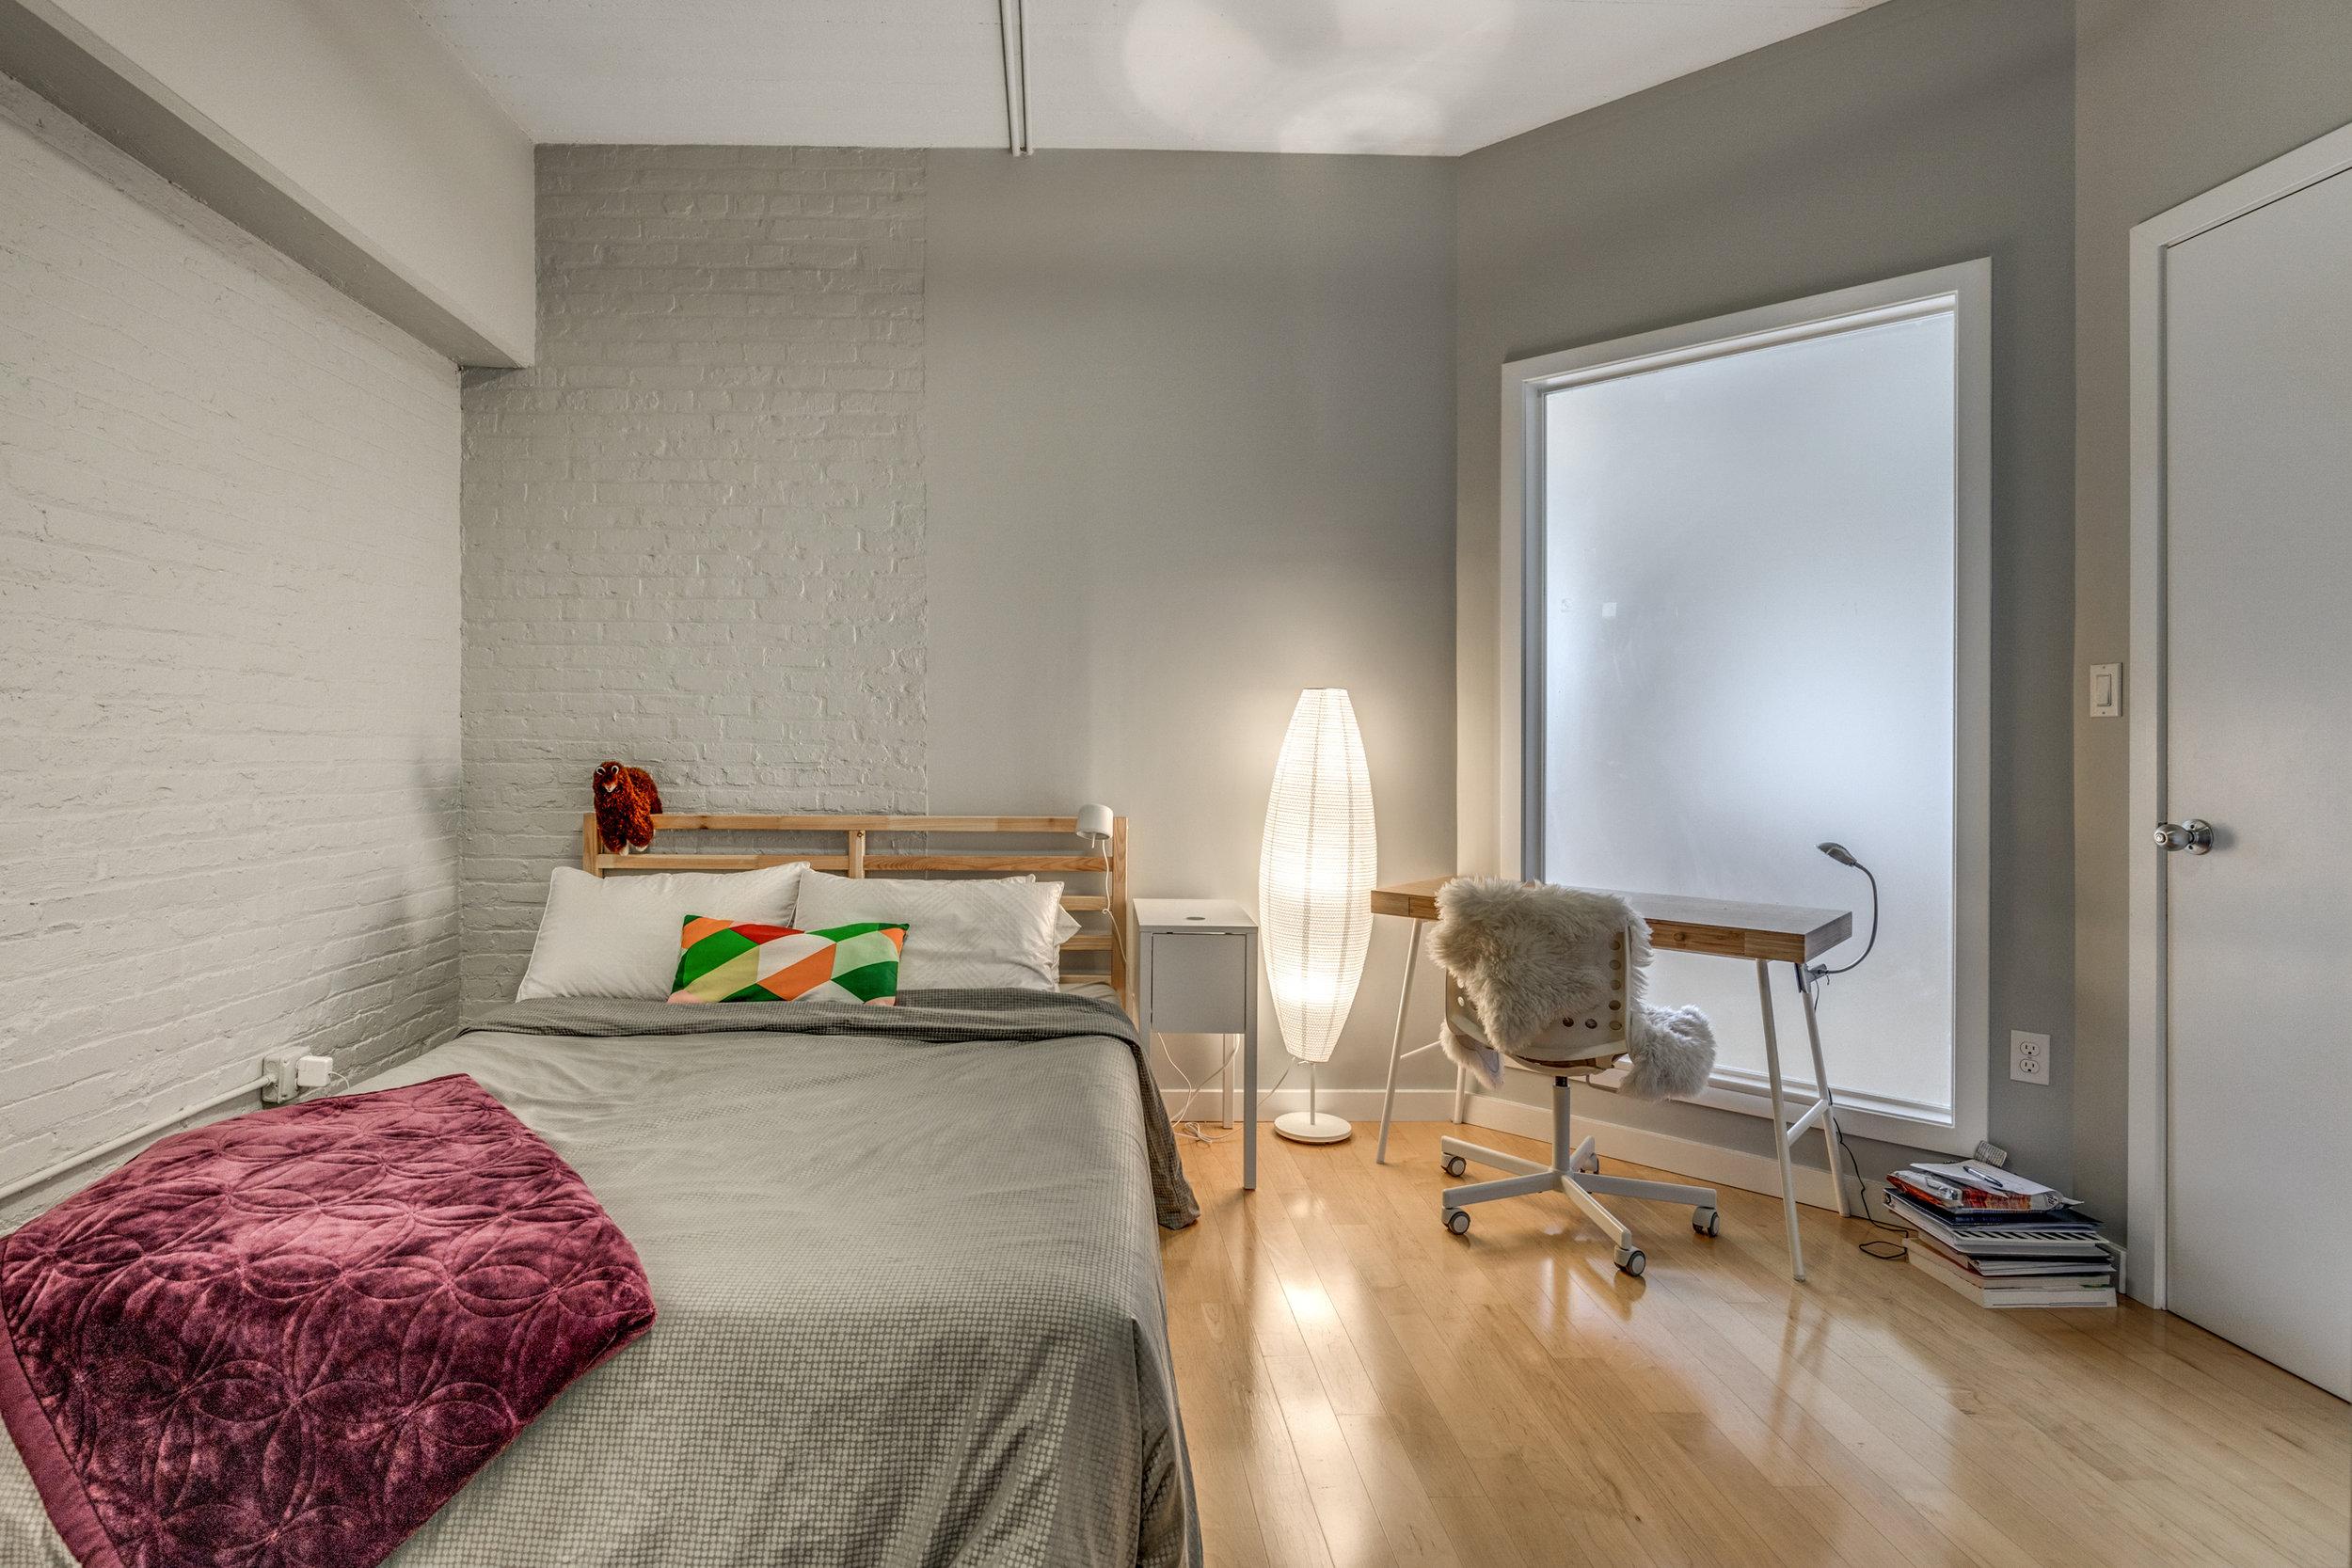 23_Bedroom2.jpg